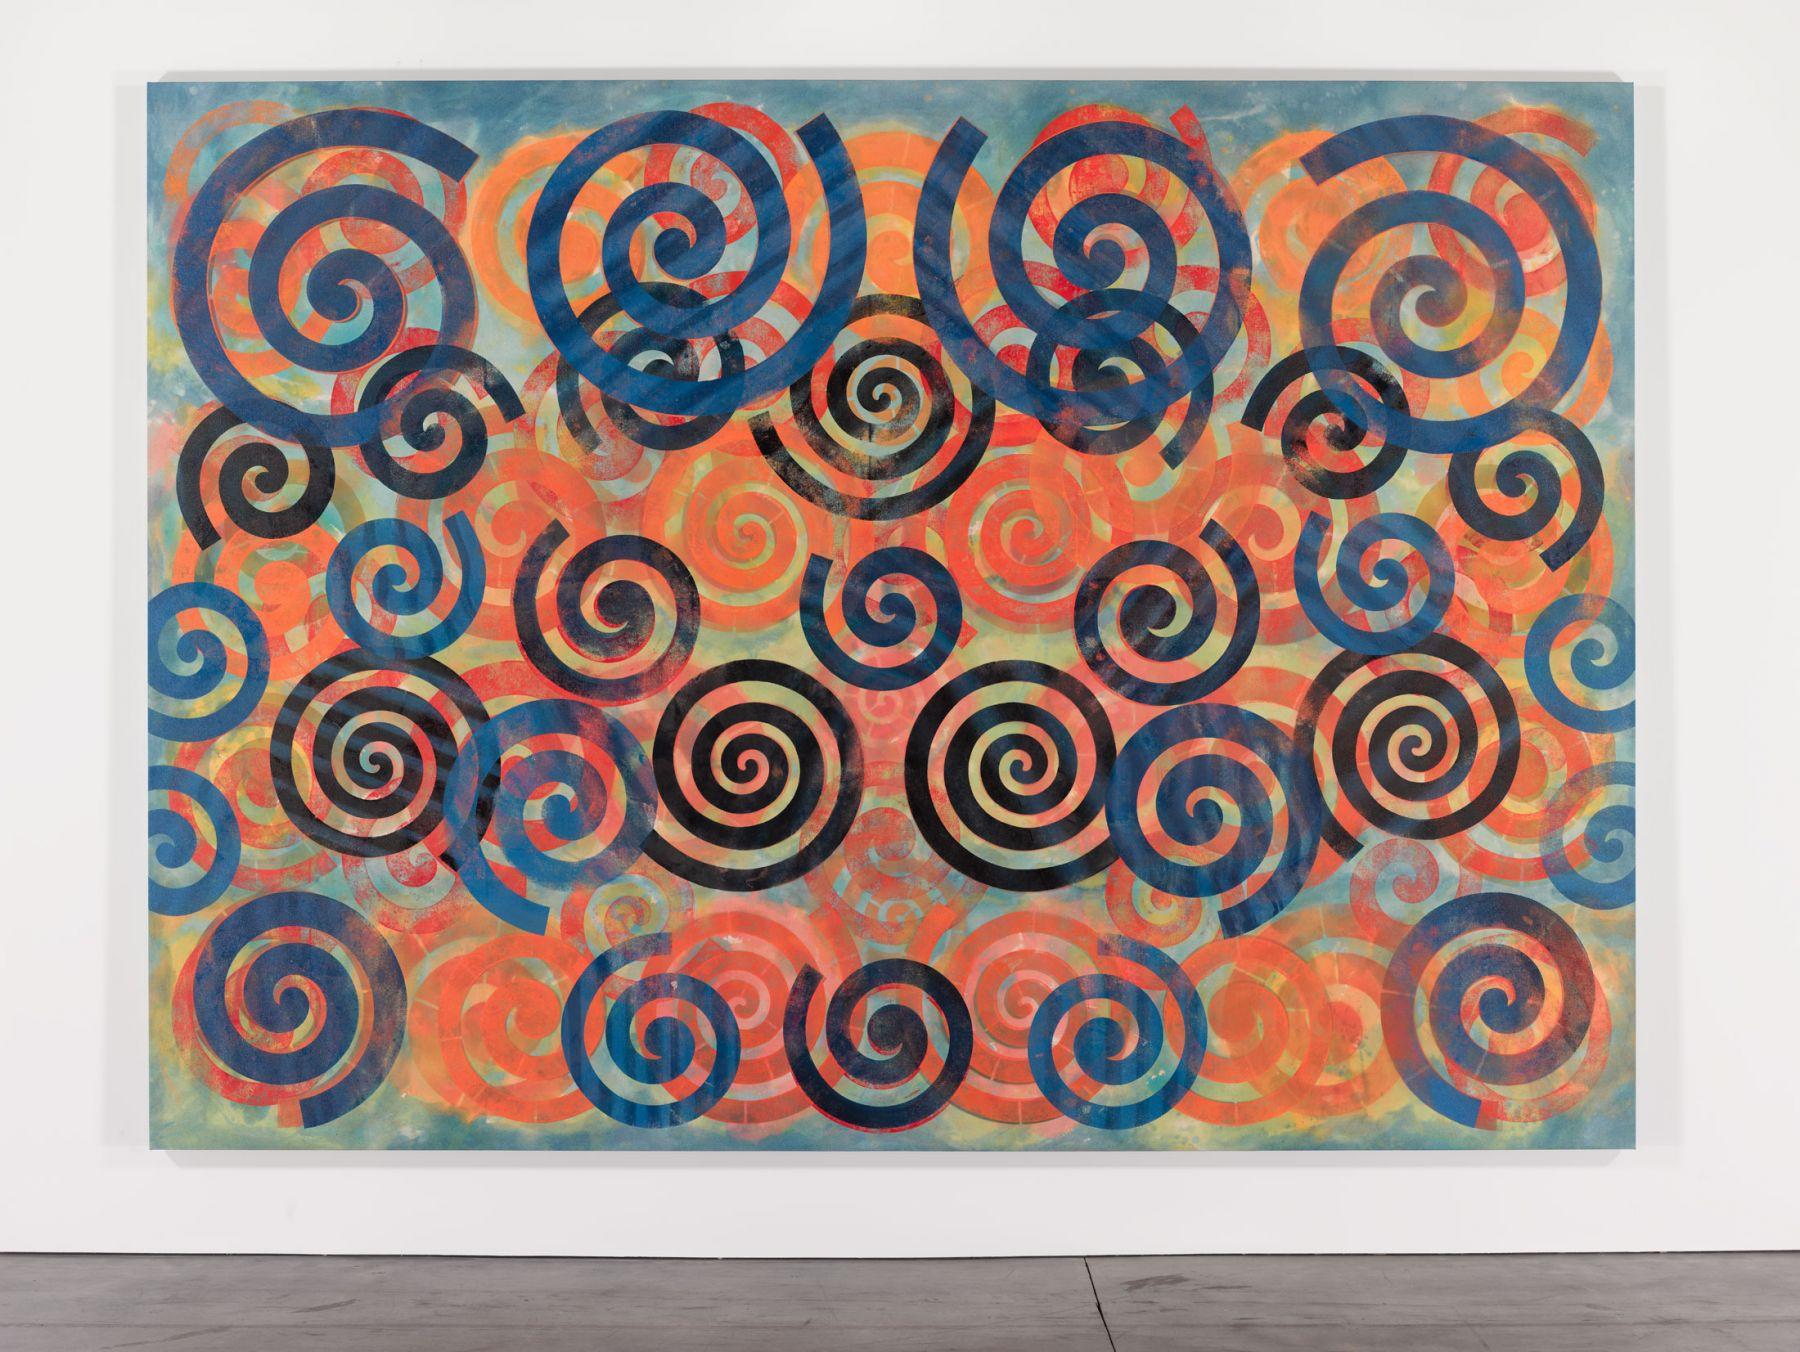 Philip Taaffe Spiral Painting II, 2015